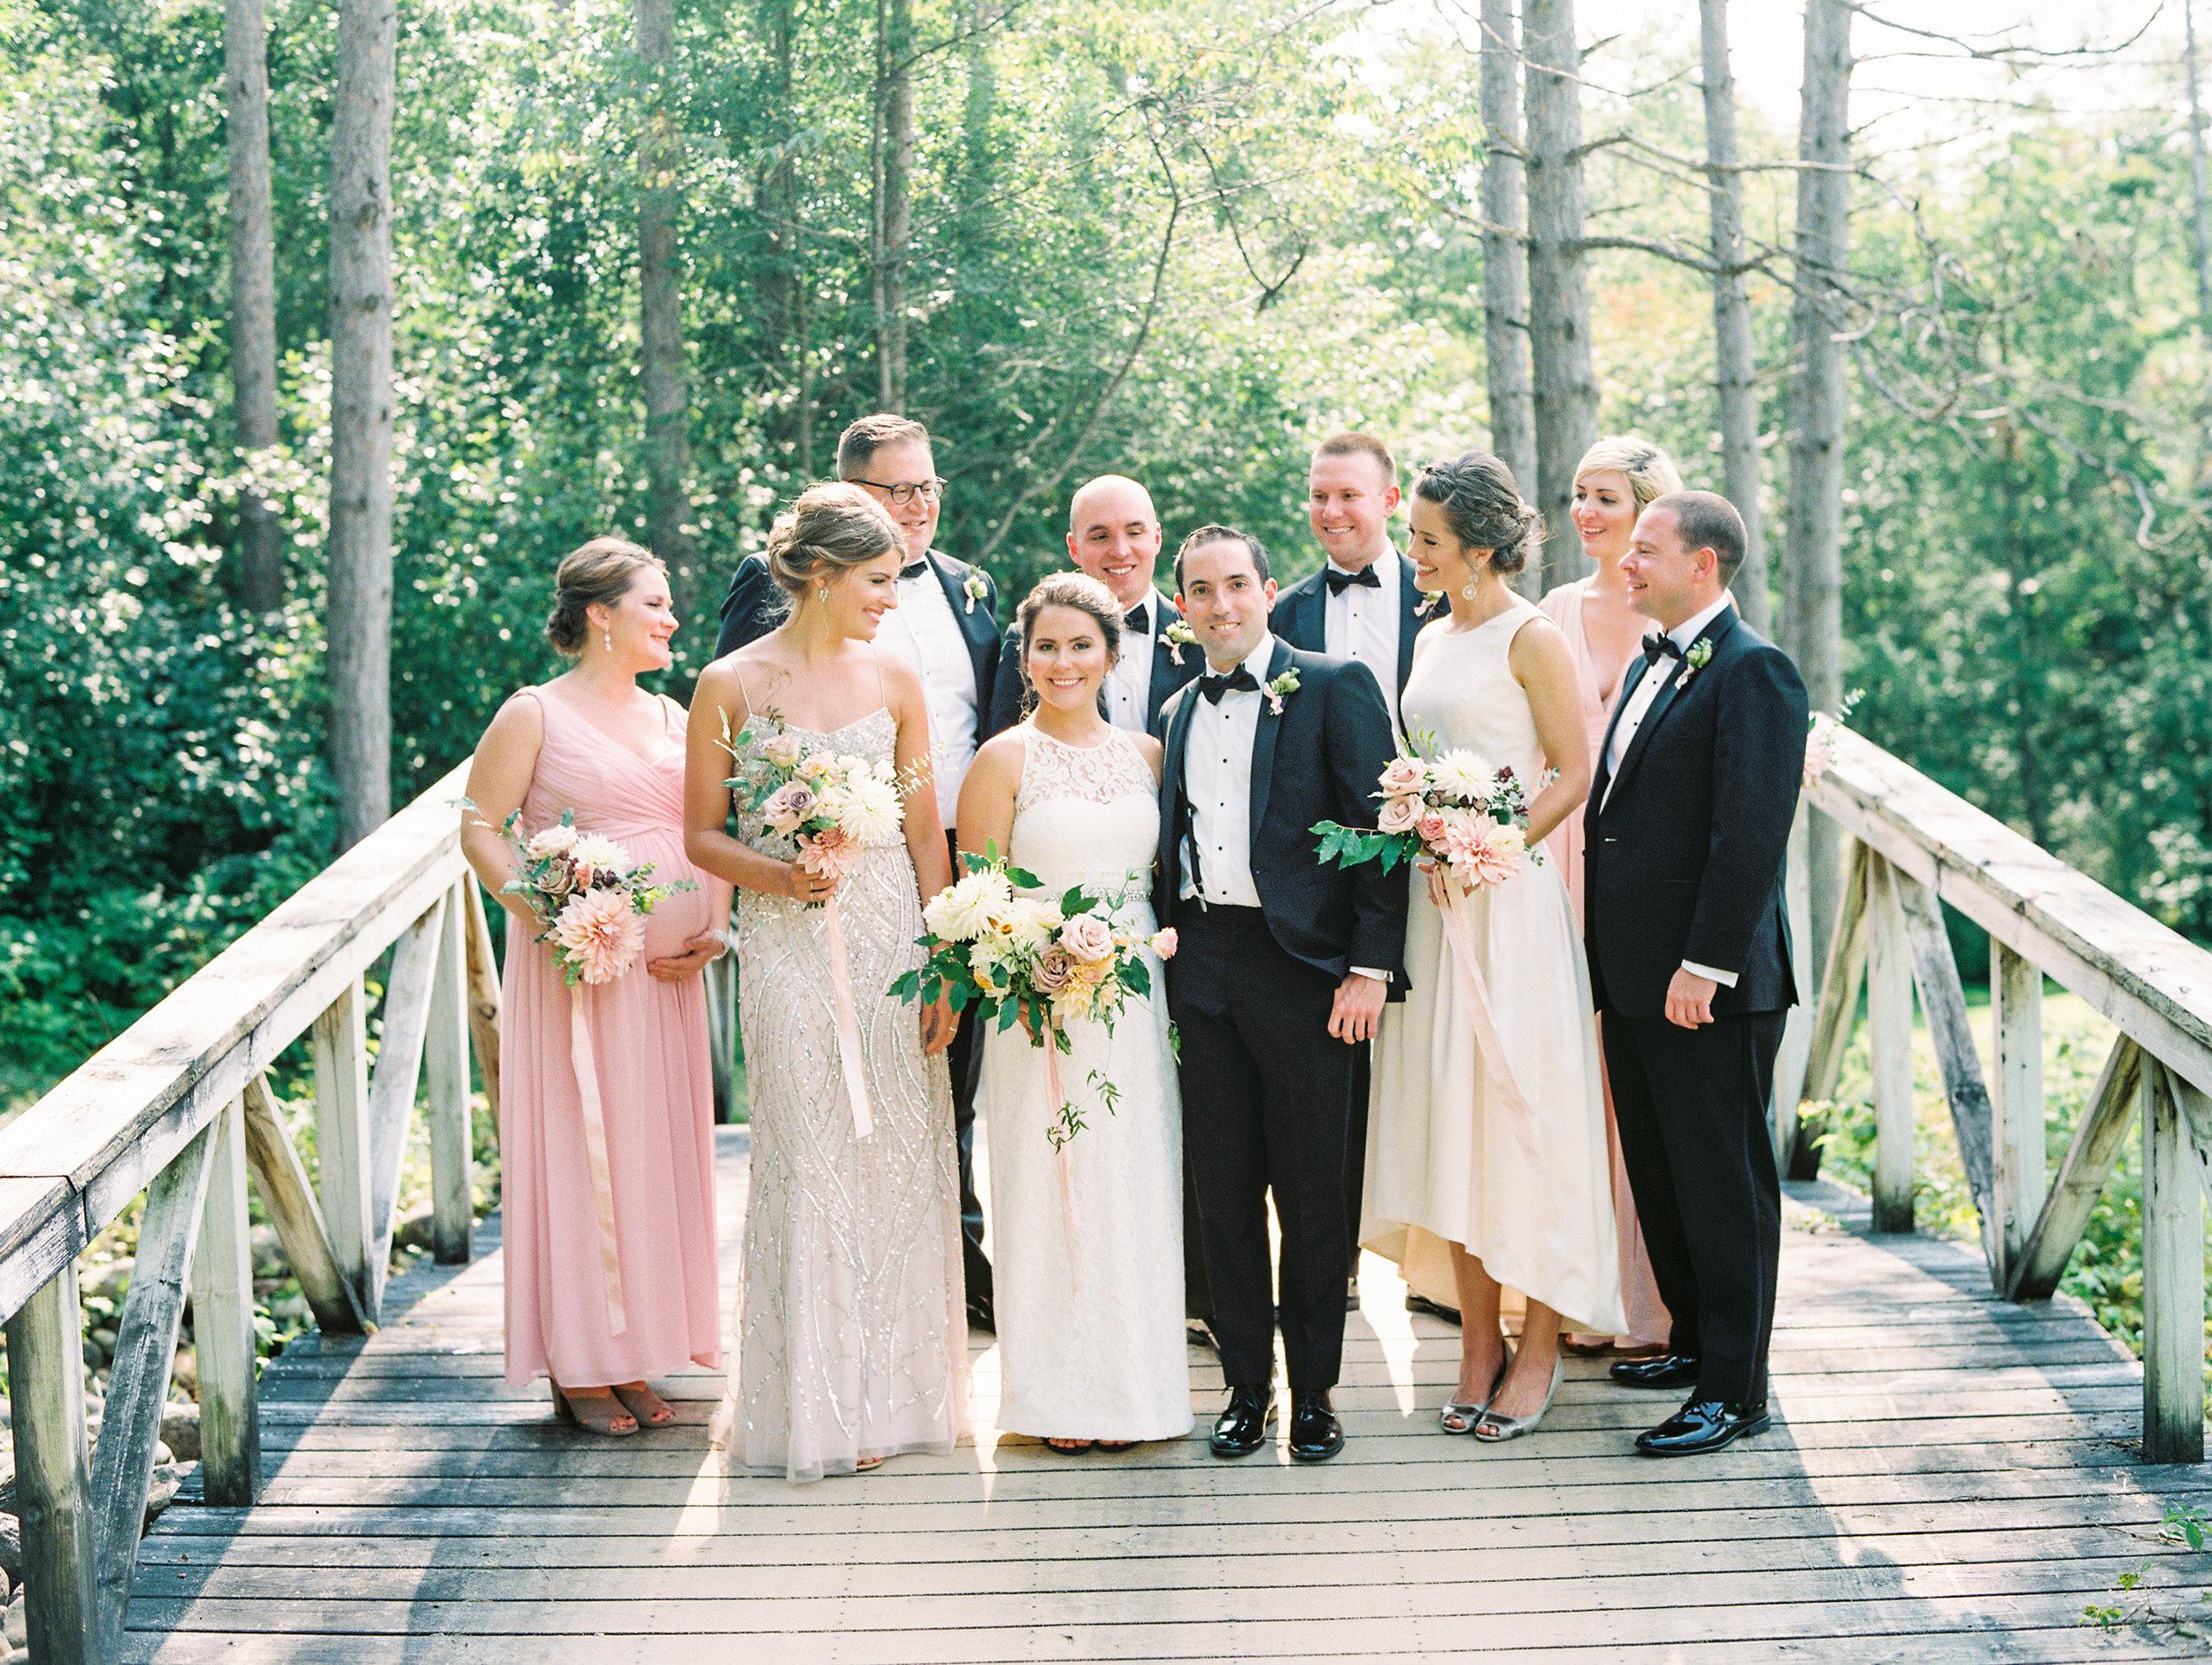 Zoller+Wedding+Bridal+Partyf-70.jpg